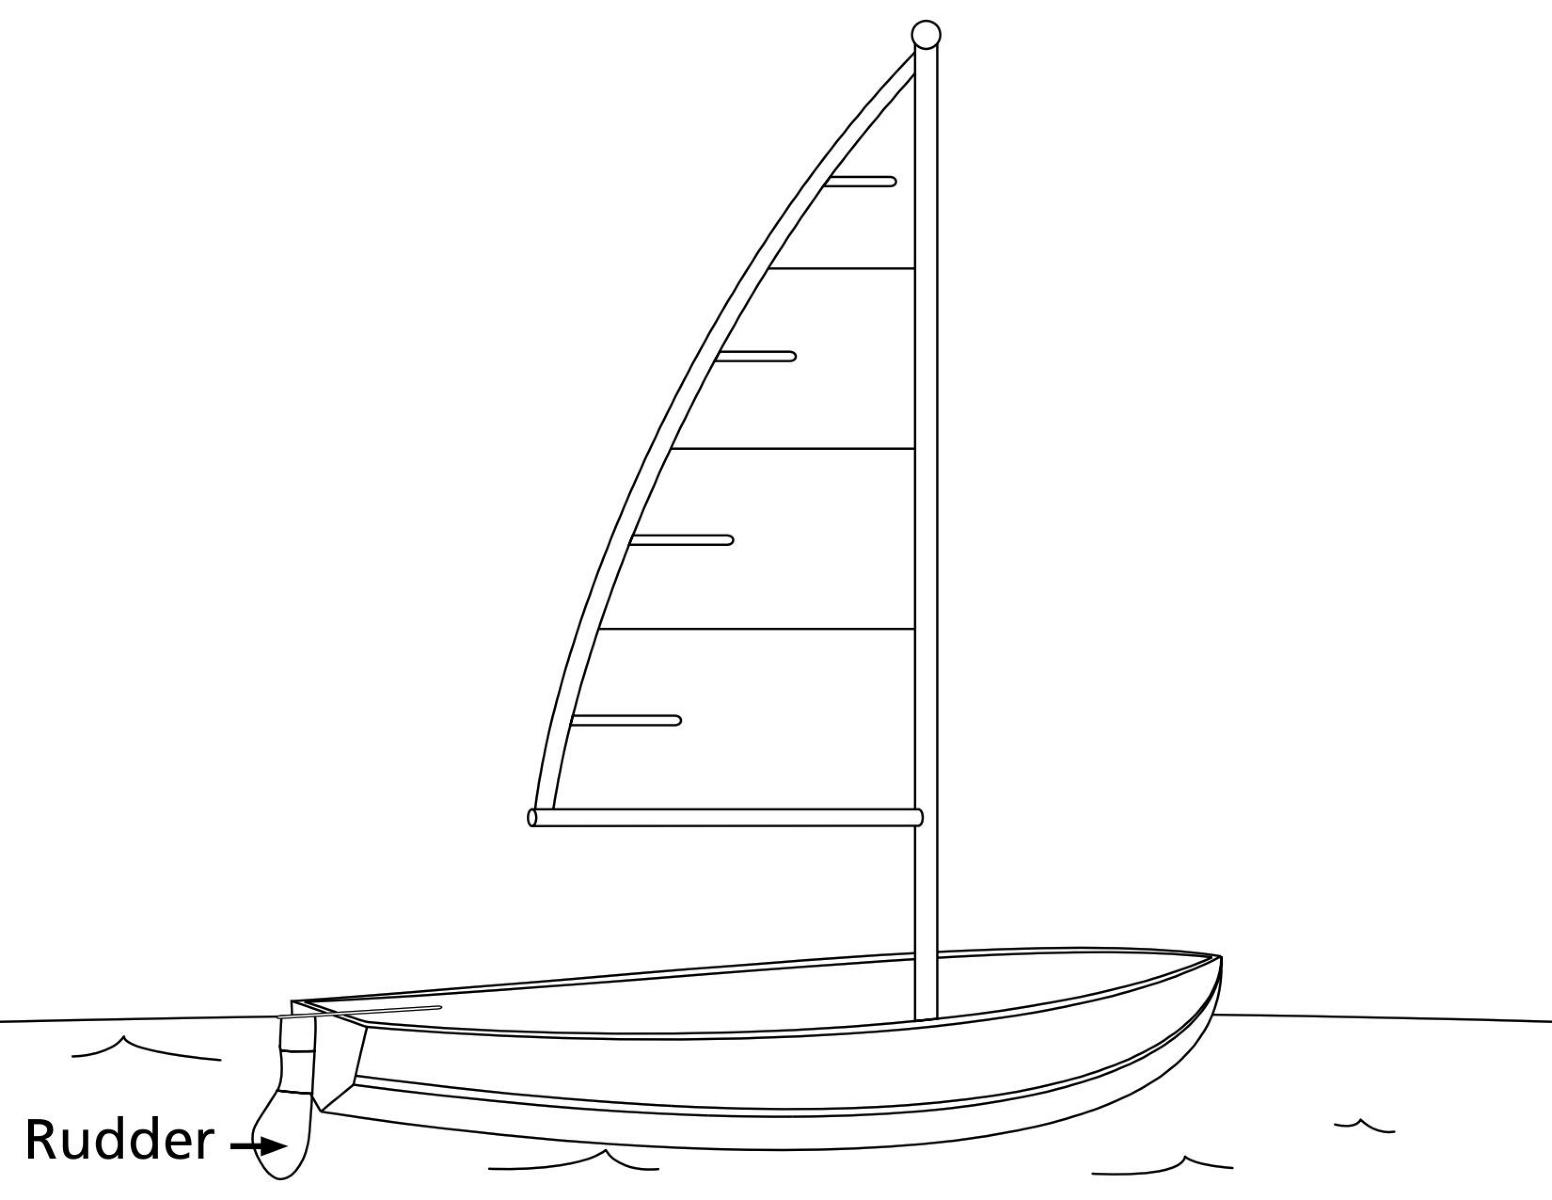 sail boat rudder 1581681 print jpg lang u003deng u0026clang u003dase